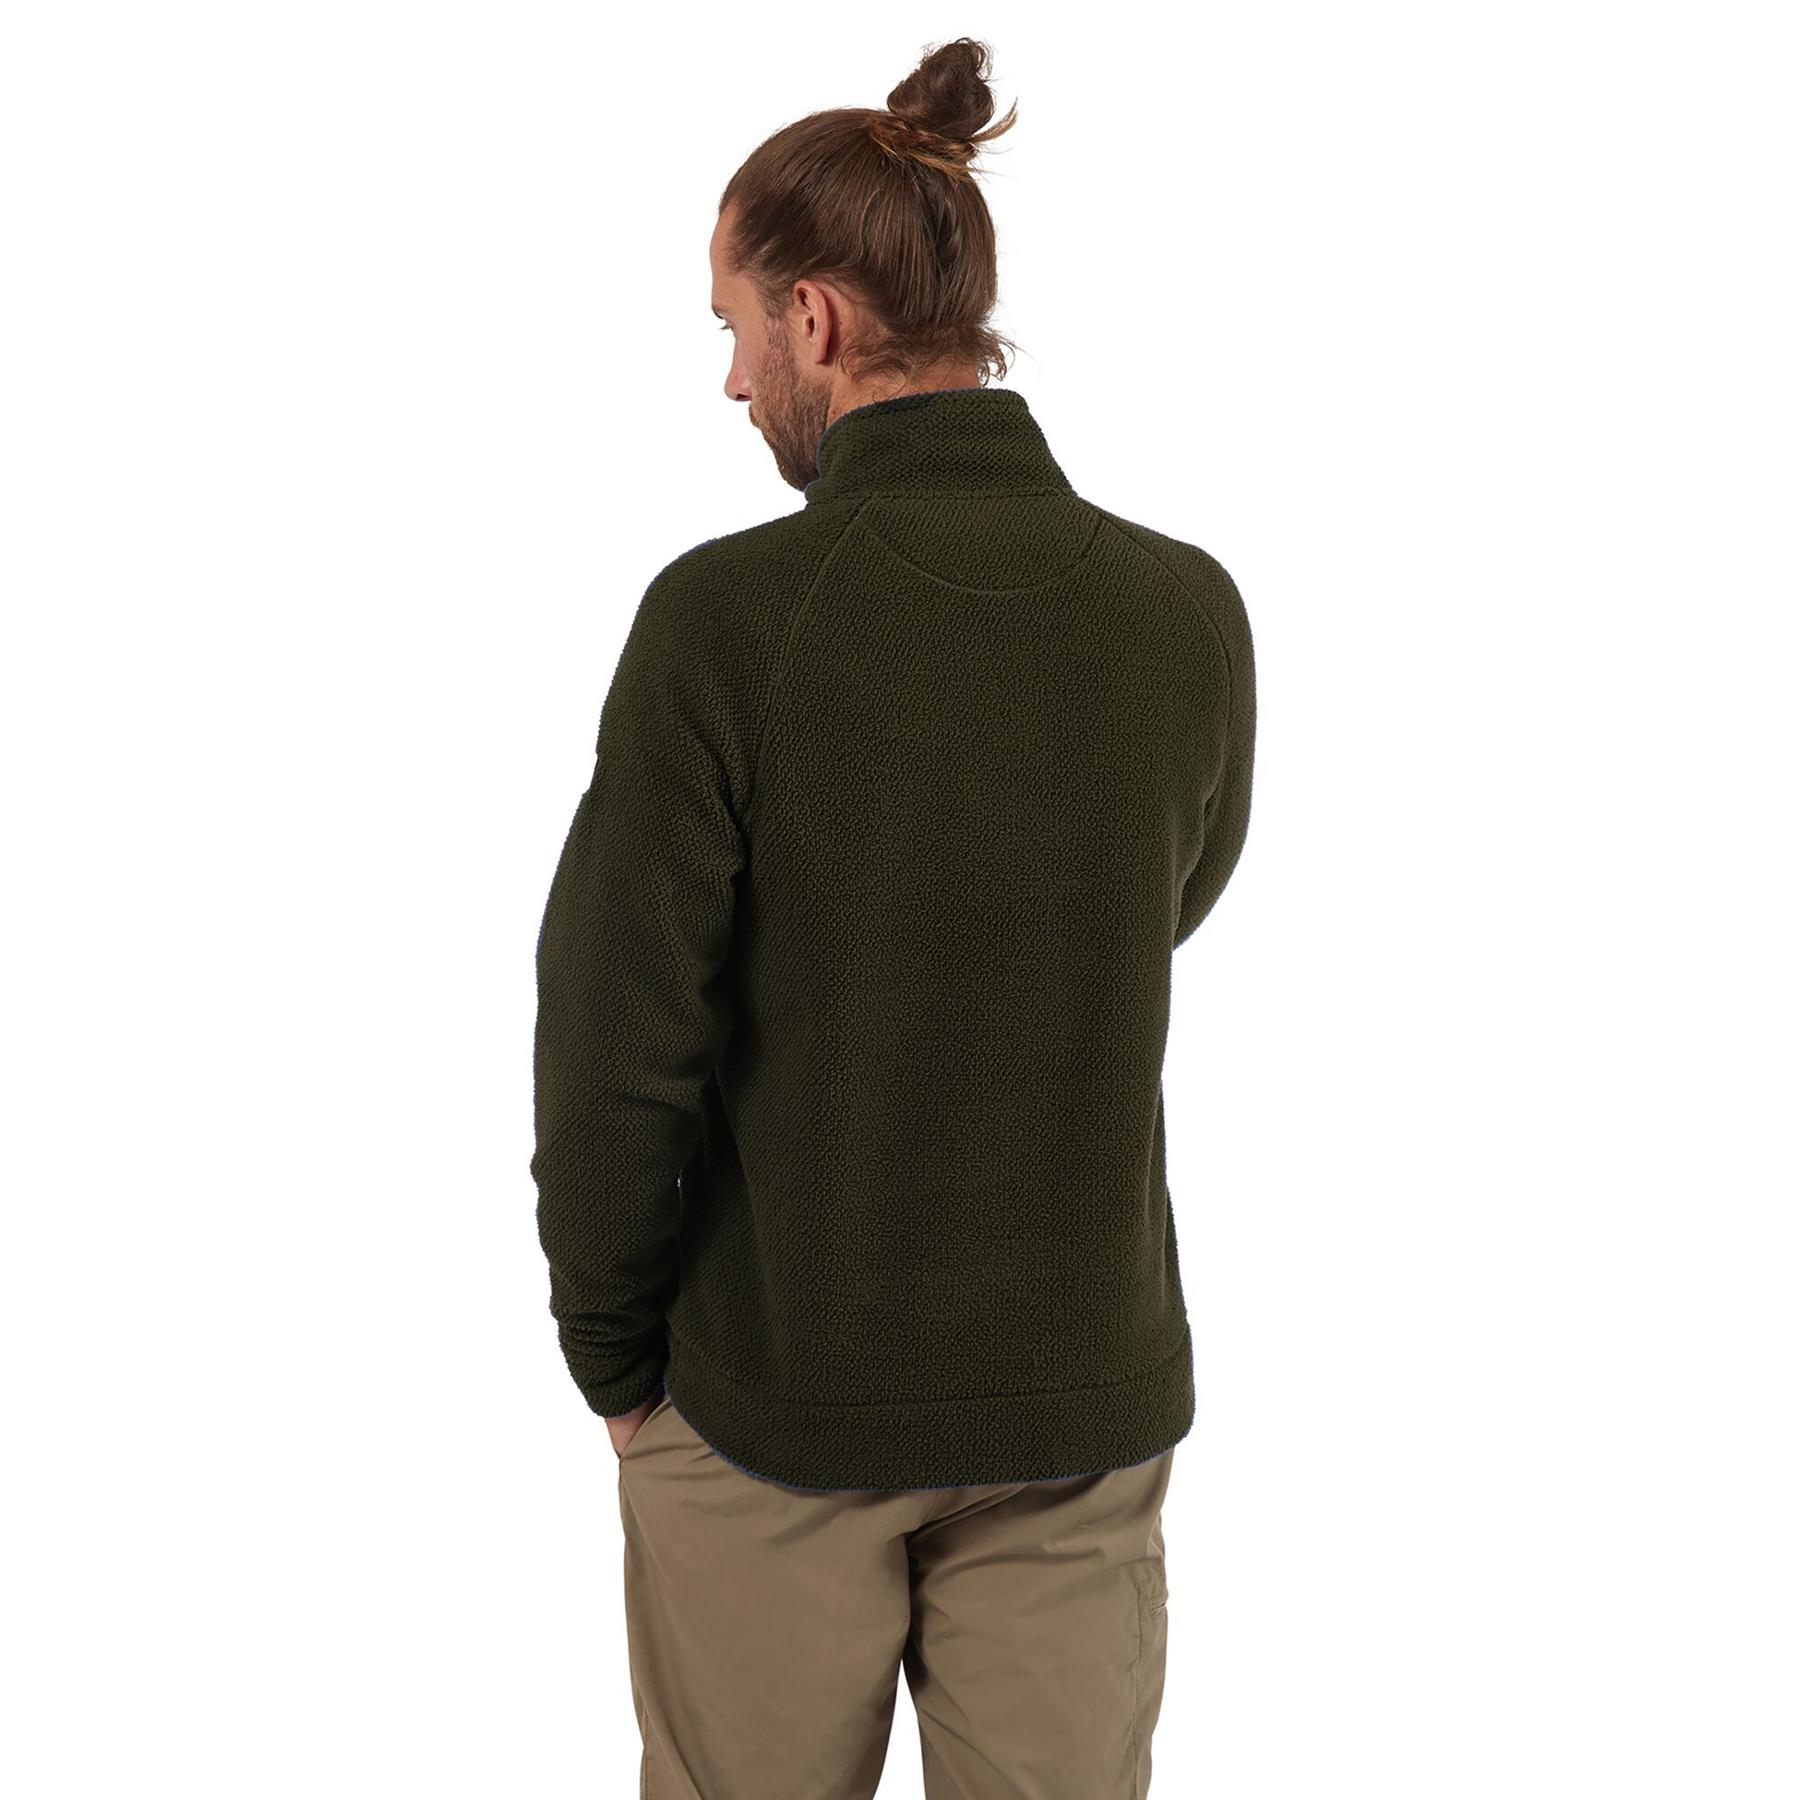 miniatuur 18 - Craghopper Mens Cason Fleece Half Zip Bobble Soft Jumper Pullover Sweater